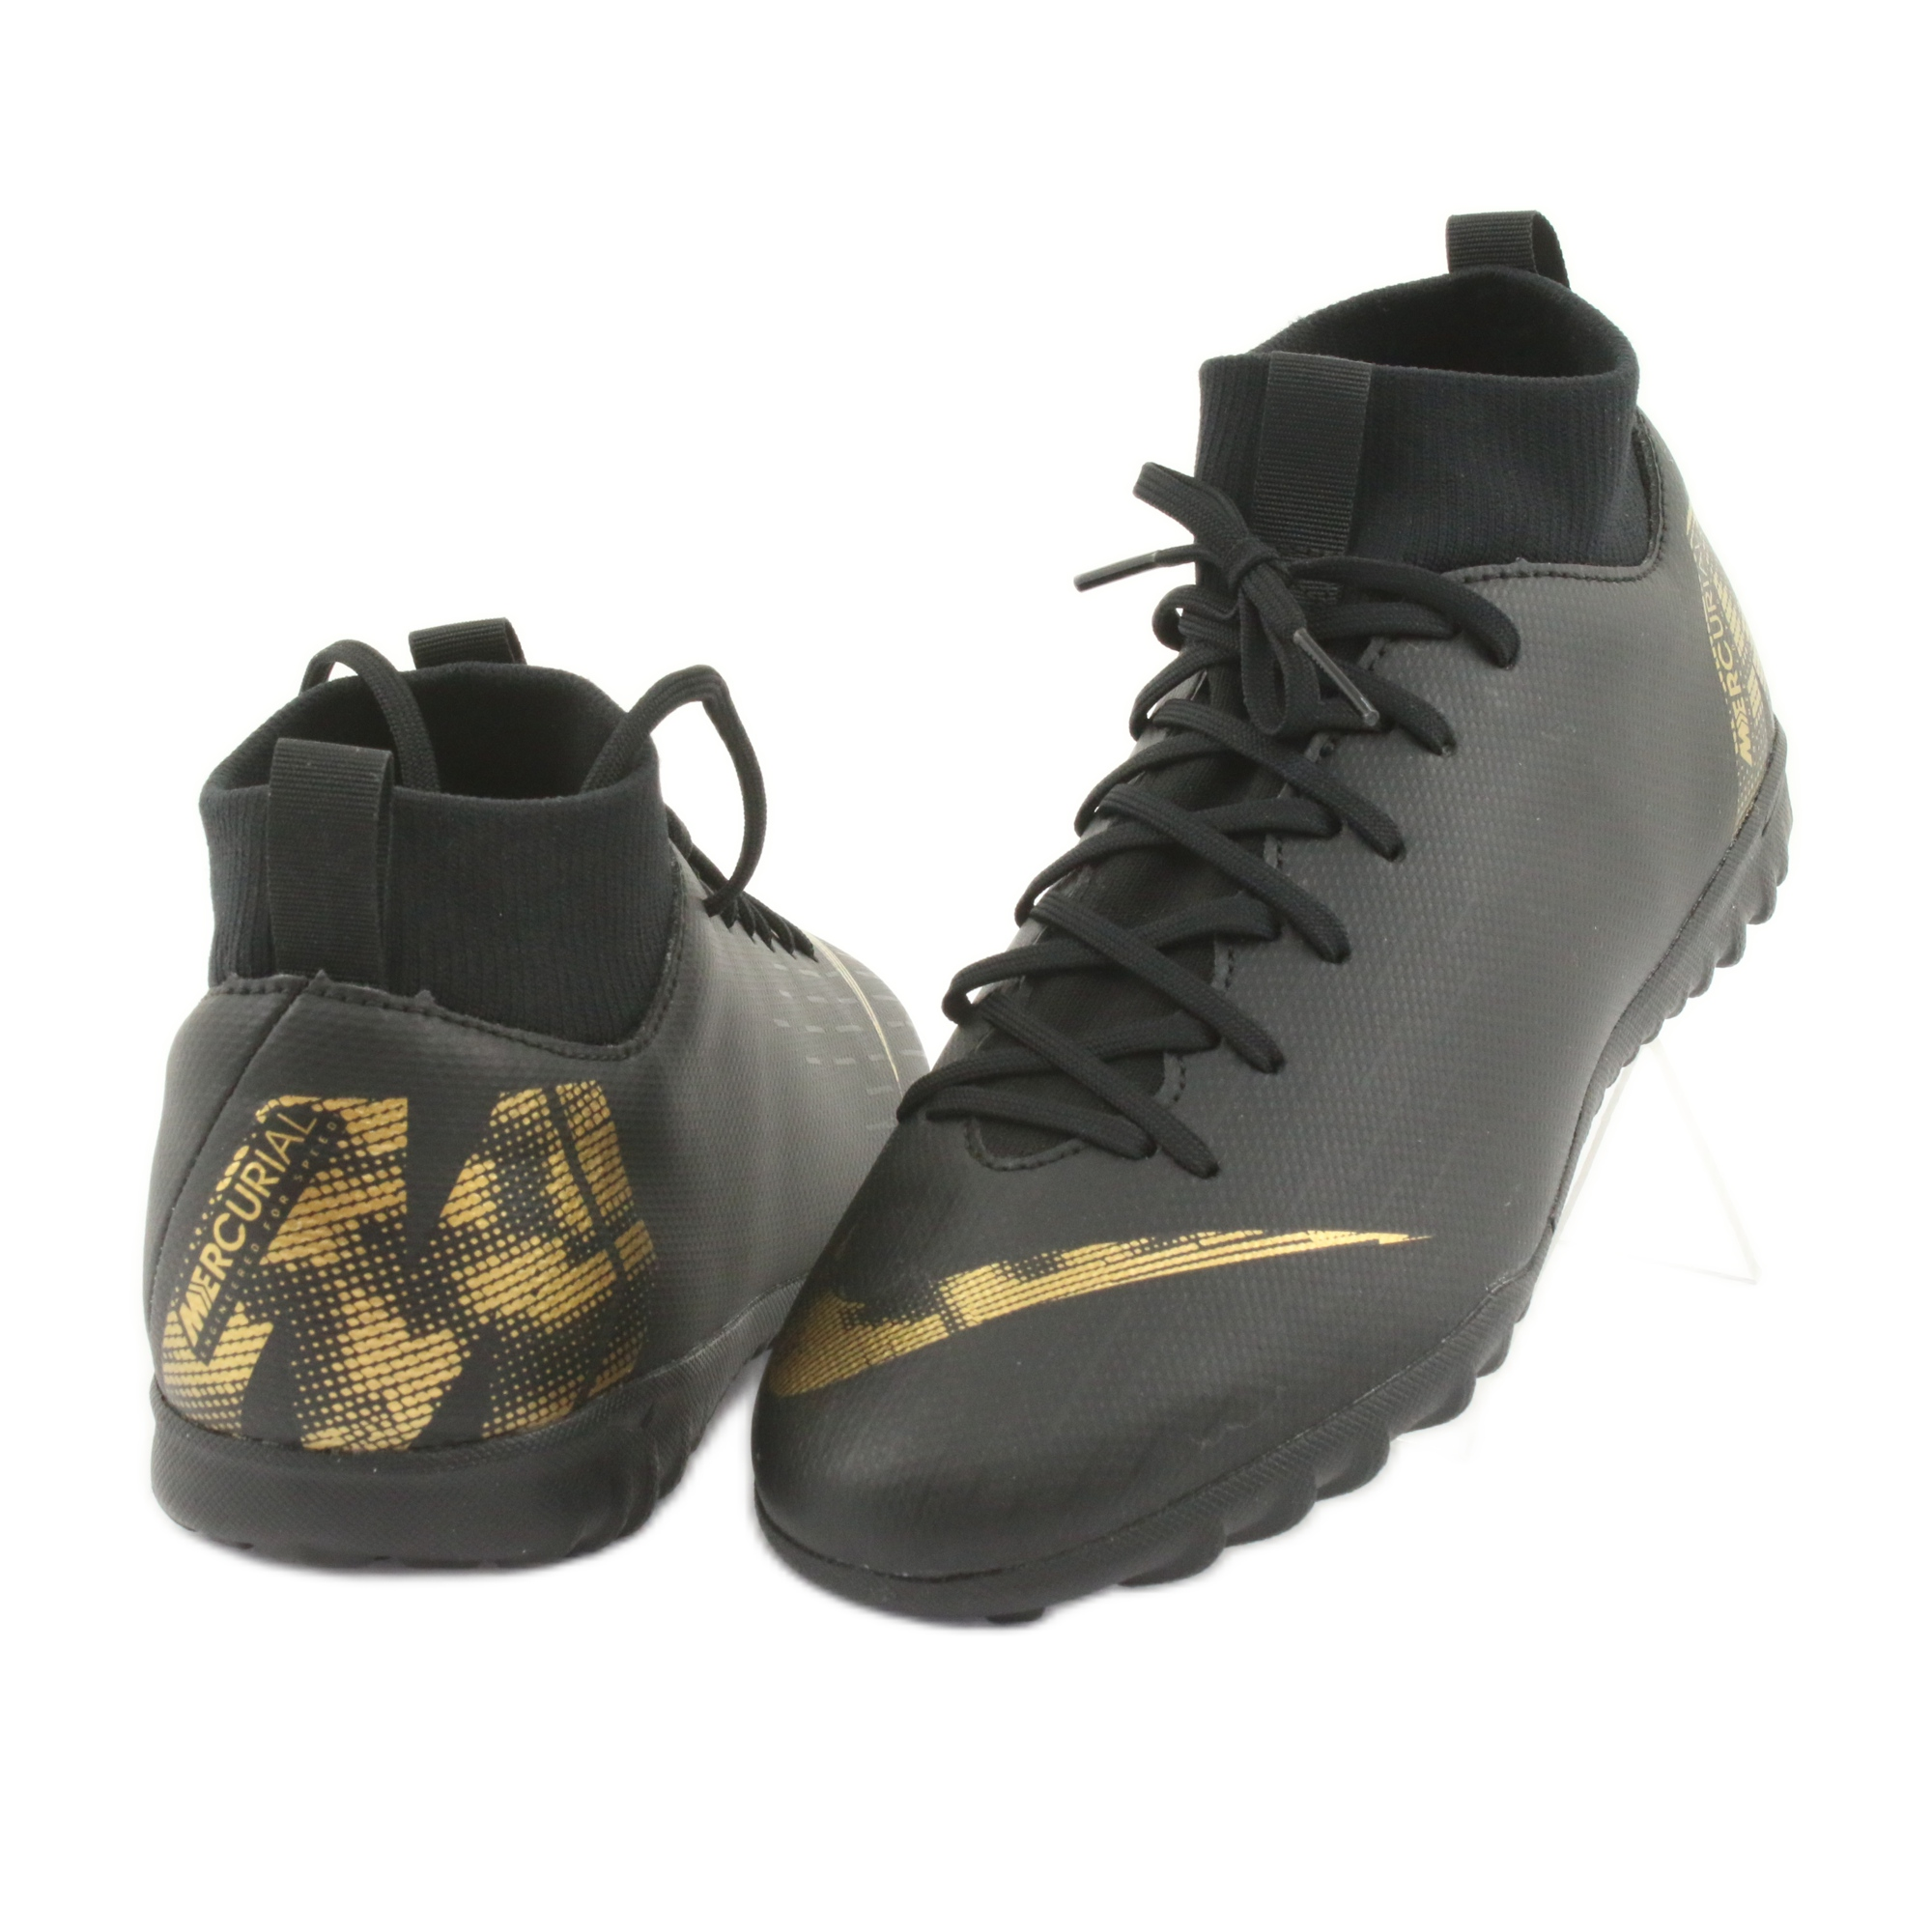 size 40 8714f a1515 Football shoes Nike Mercurial SuperflyX 6 Academy Gs Tf Jr AH7344-077